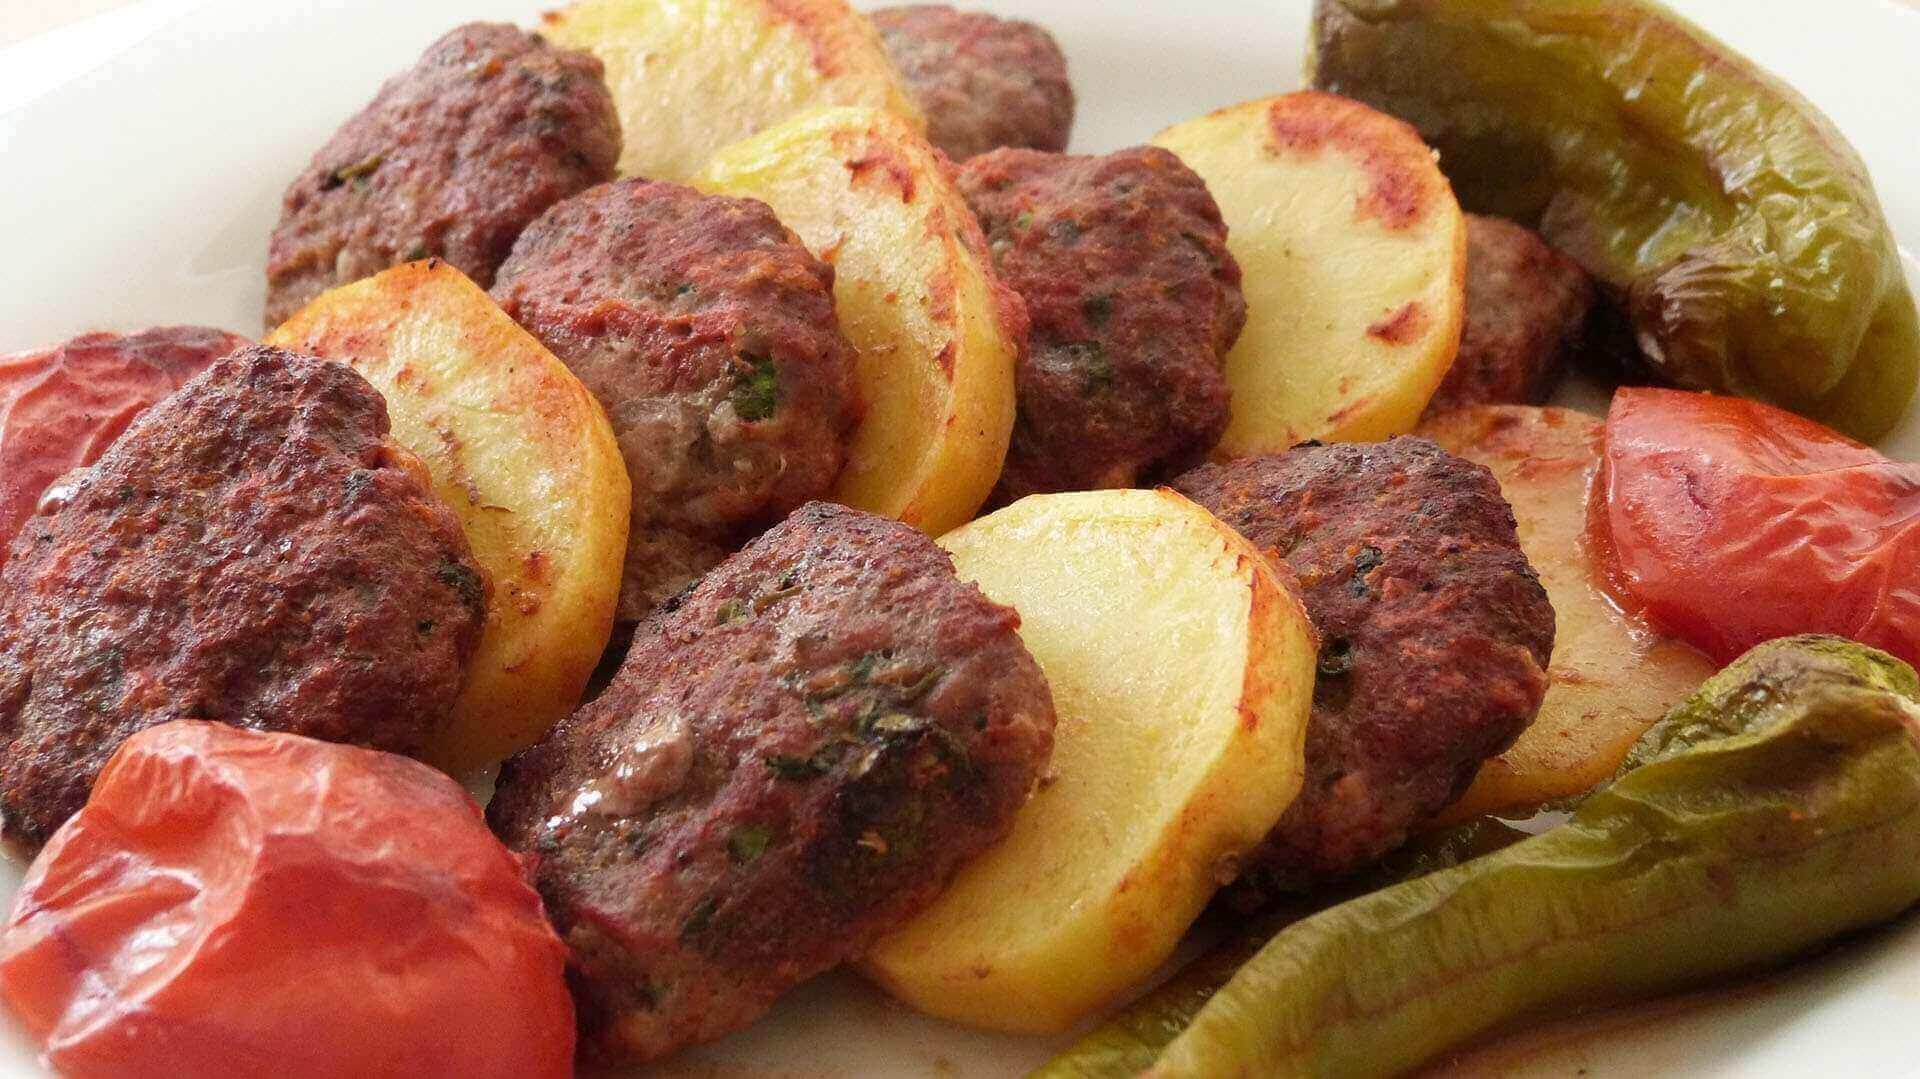 Gebackene Knöbel mit Kartoffel - Fırında Köfteli Patates